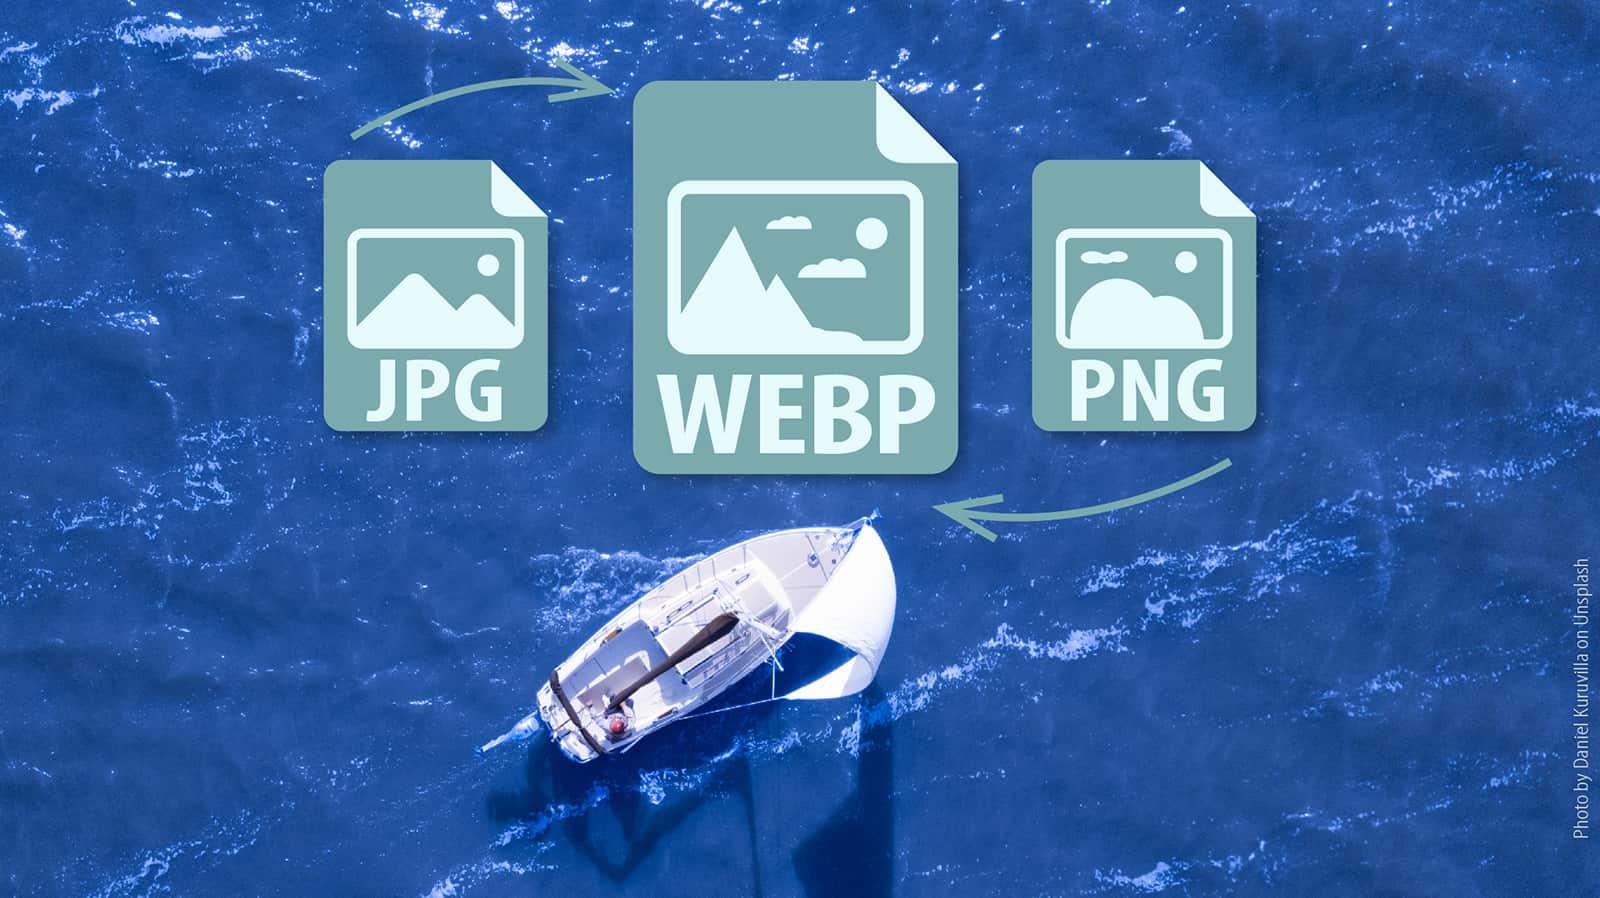 Comparison jpg png and webp image formats